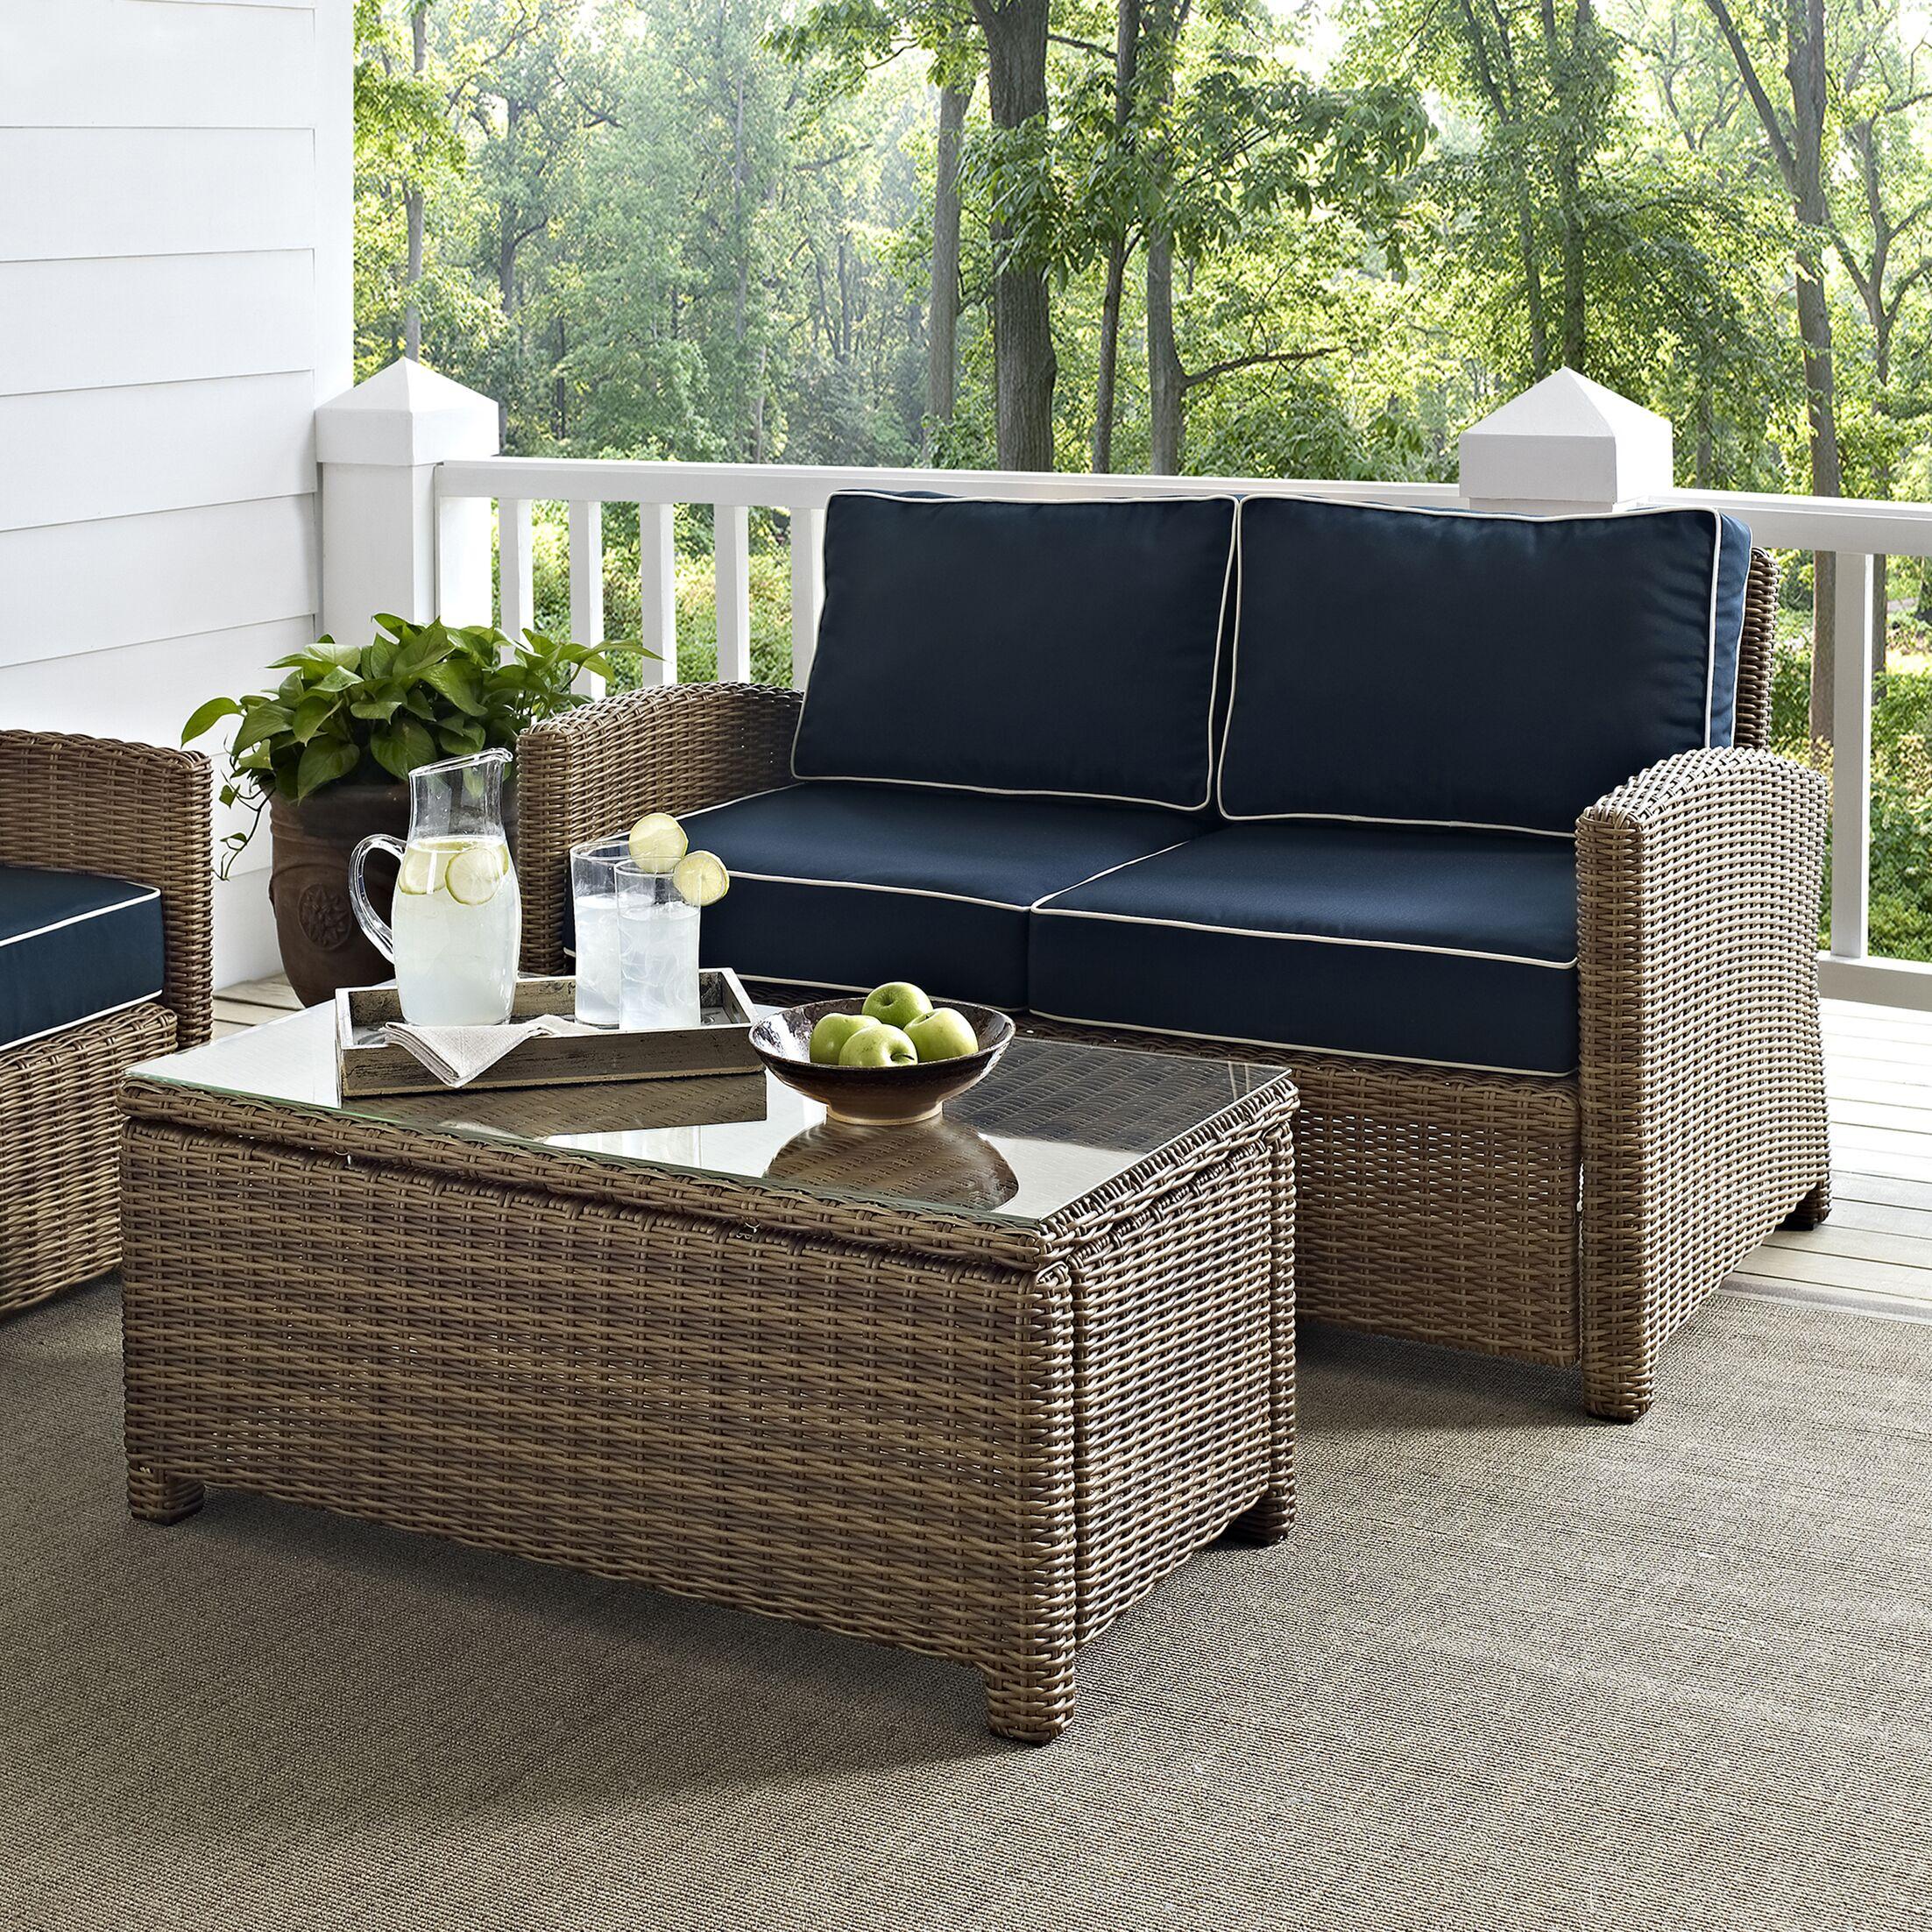 Dardel 2 Piece Sofa Set with Cushions Fabric: Navy